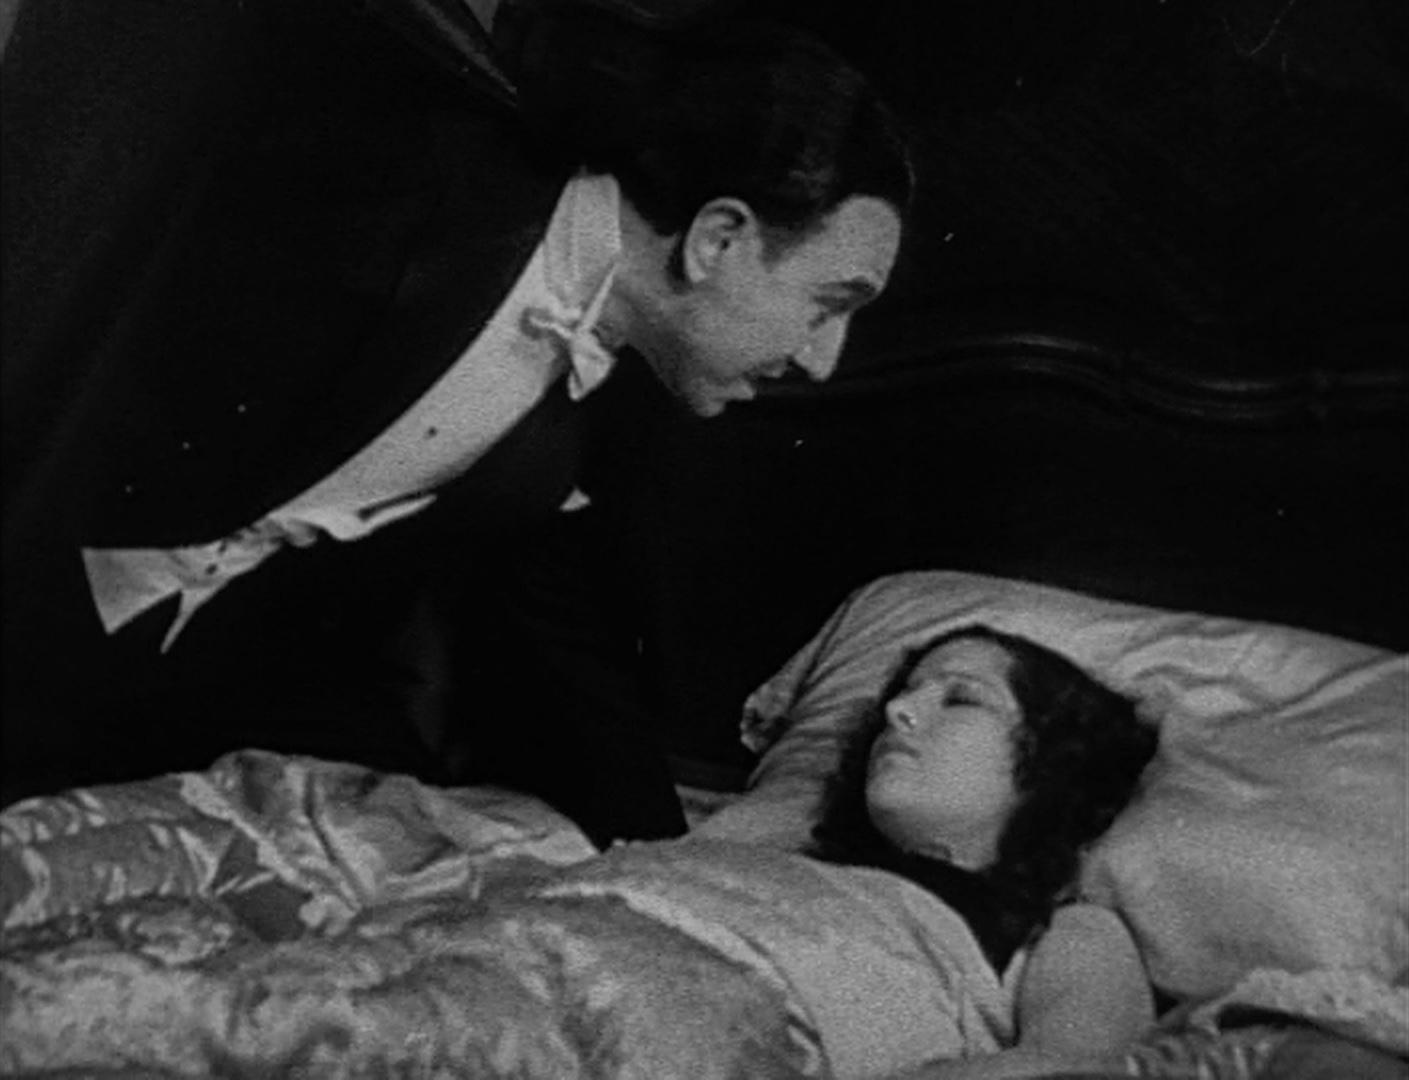 Dracula (1931